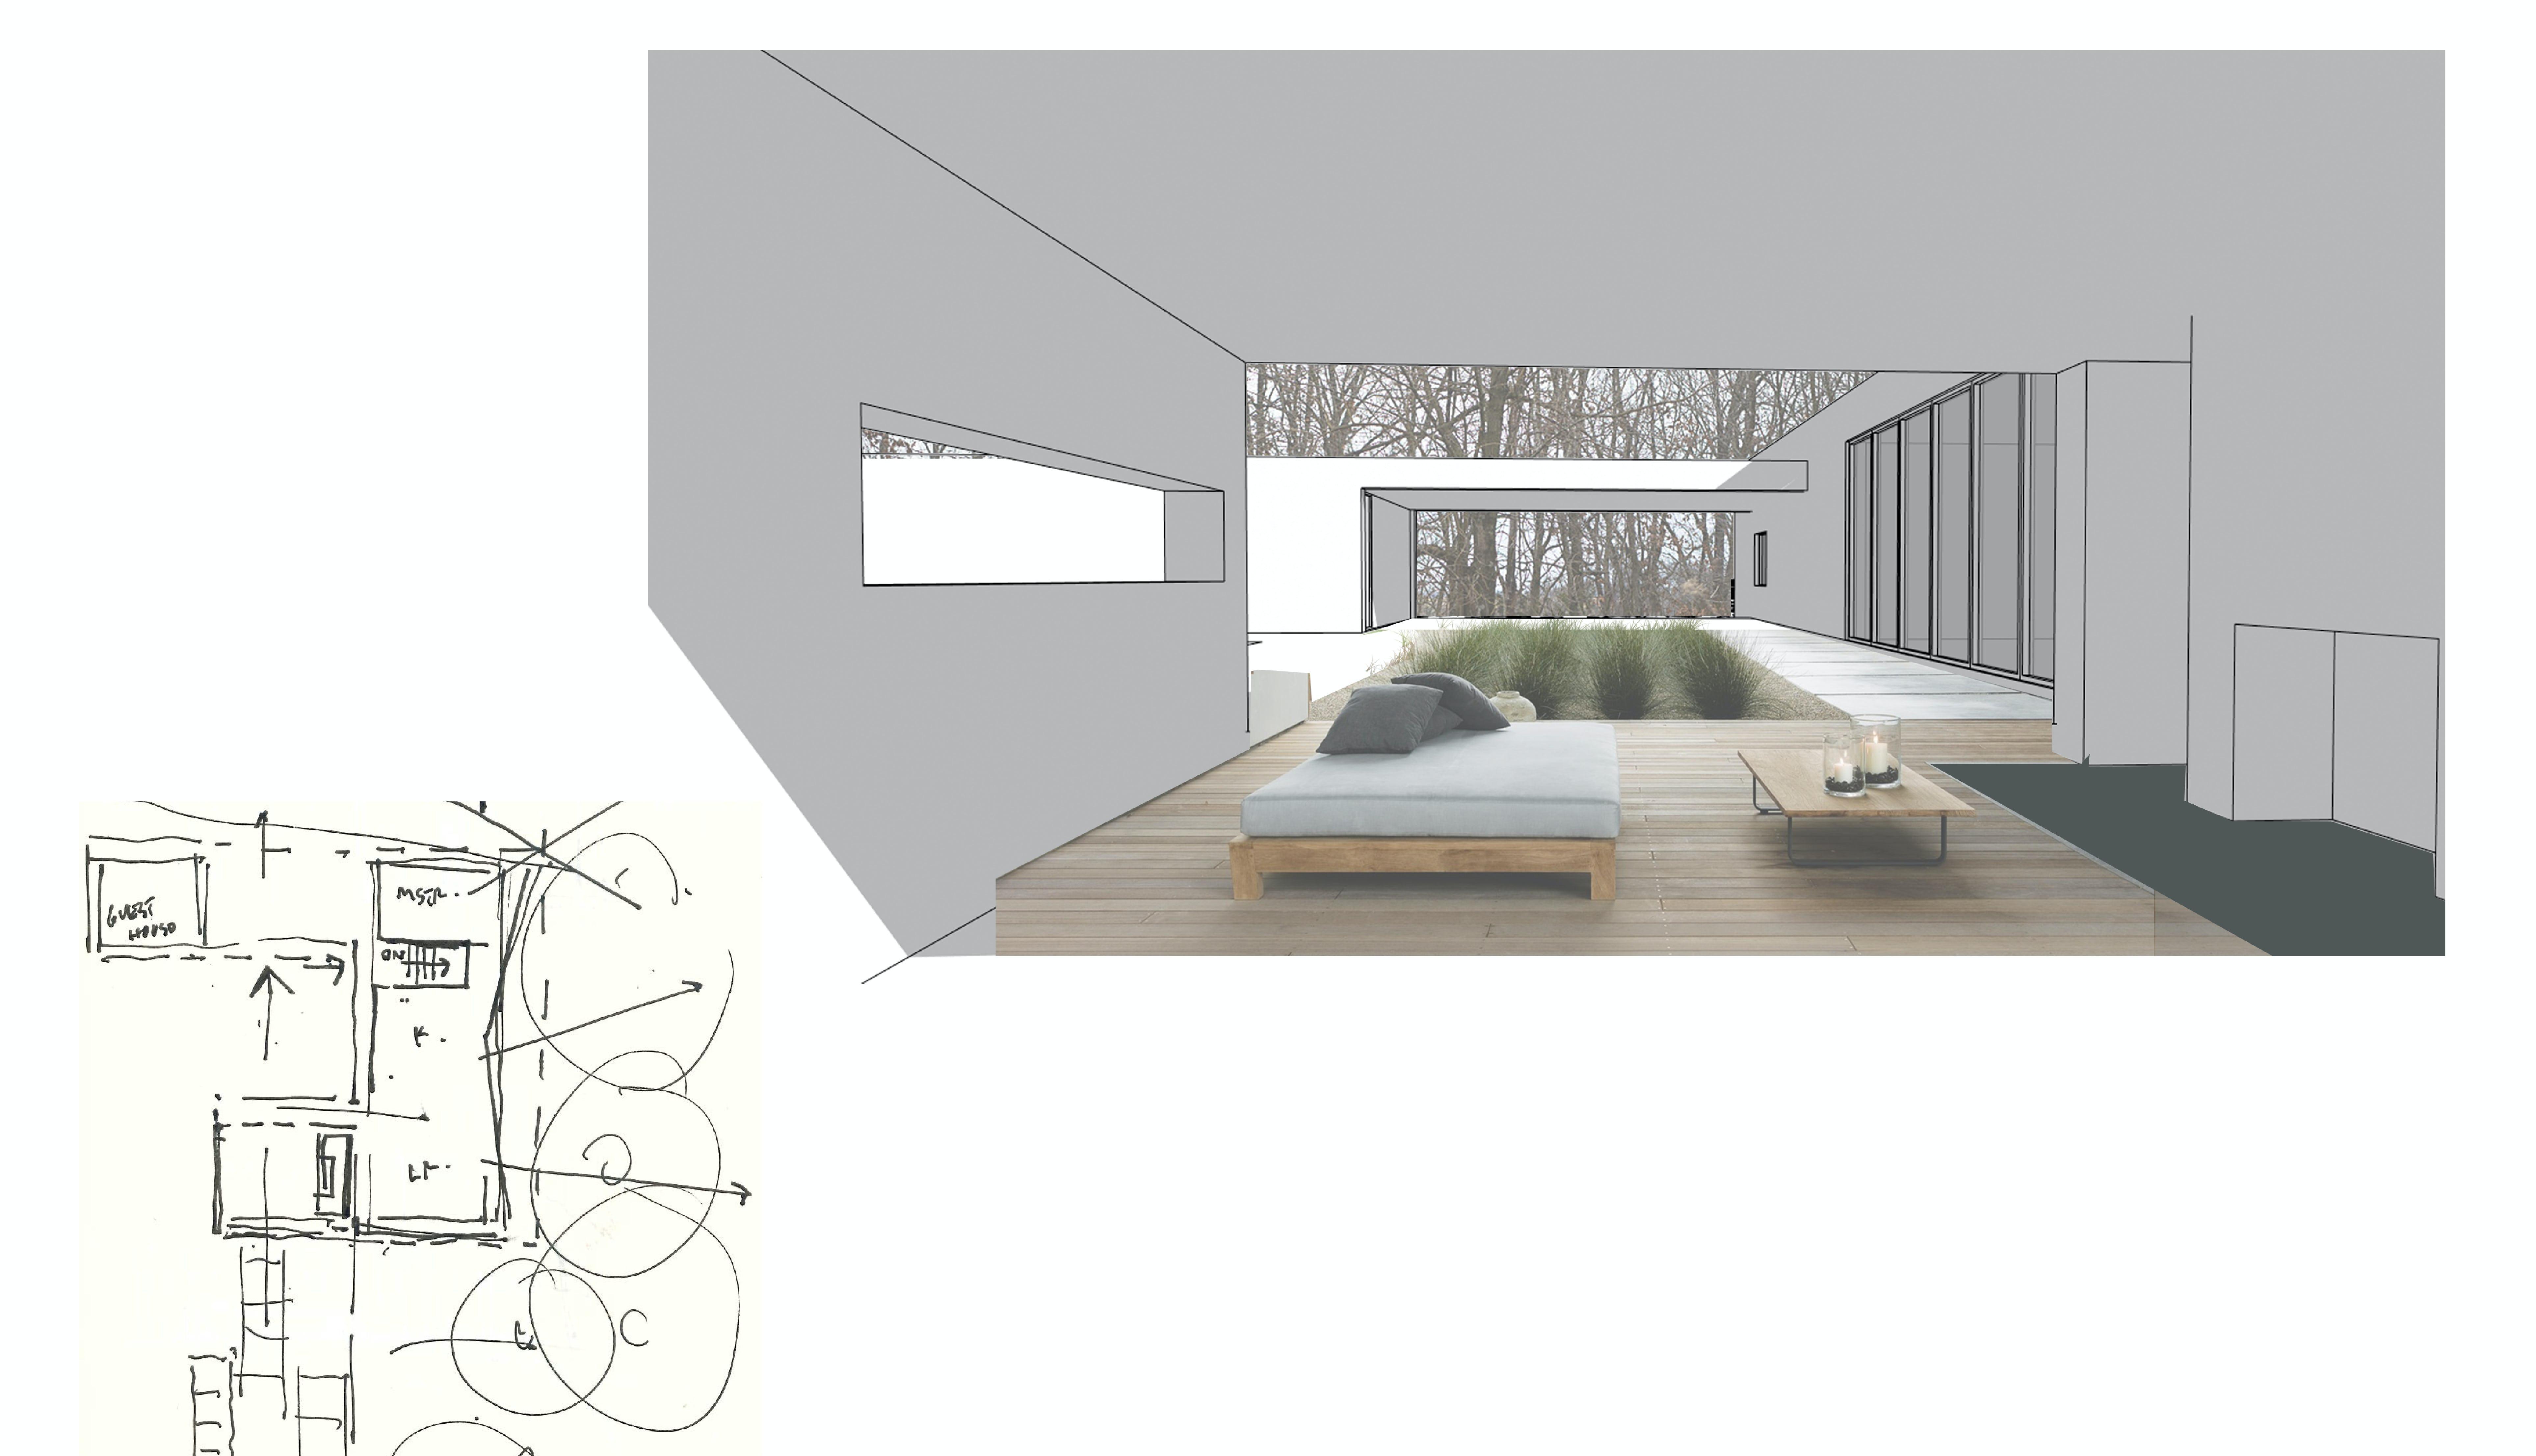 Mo house level architecture incorporated prelim views3